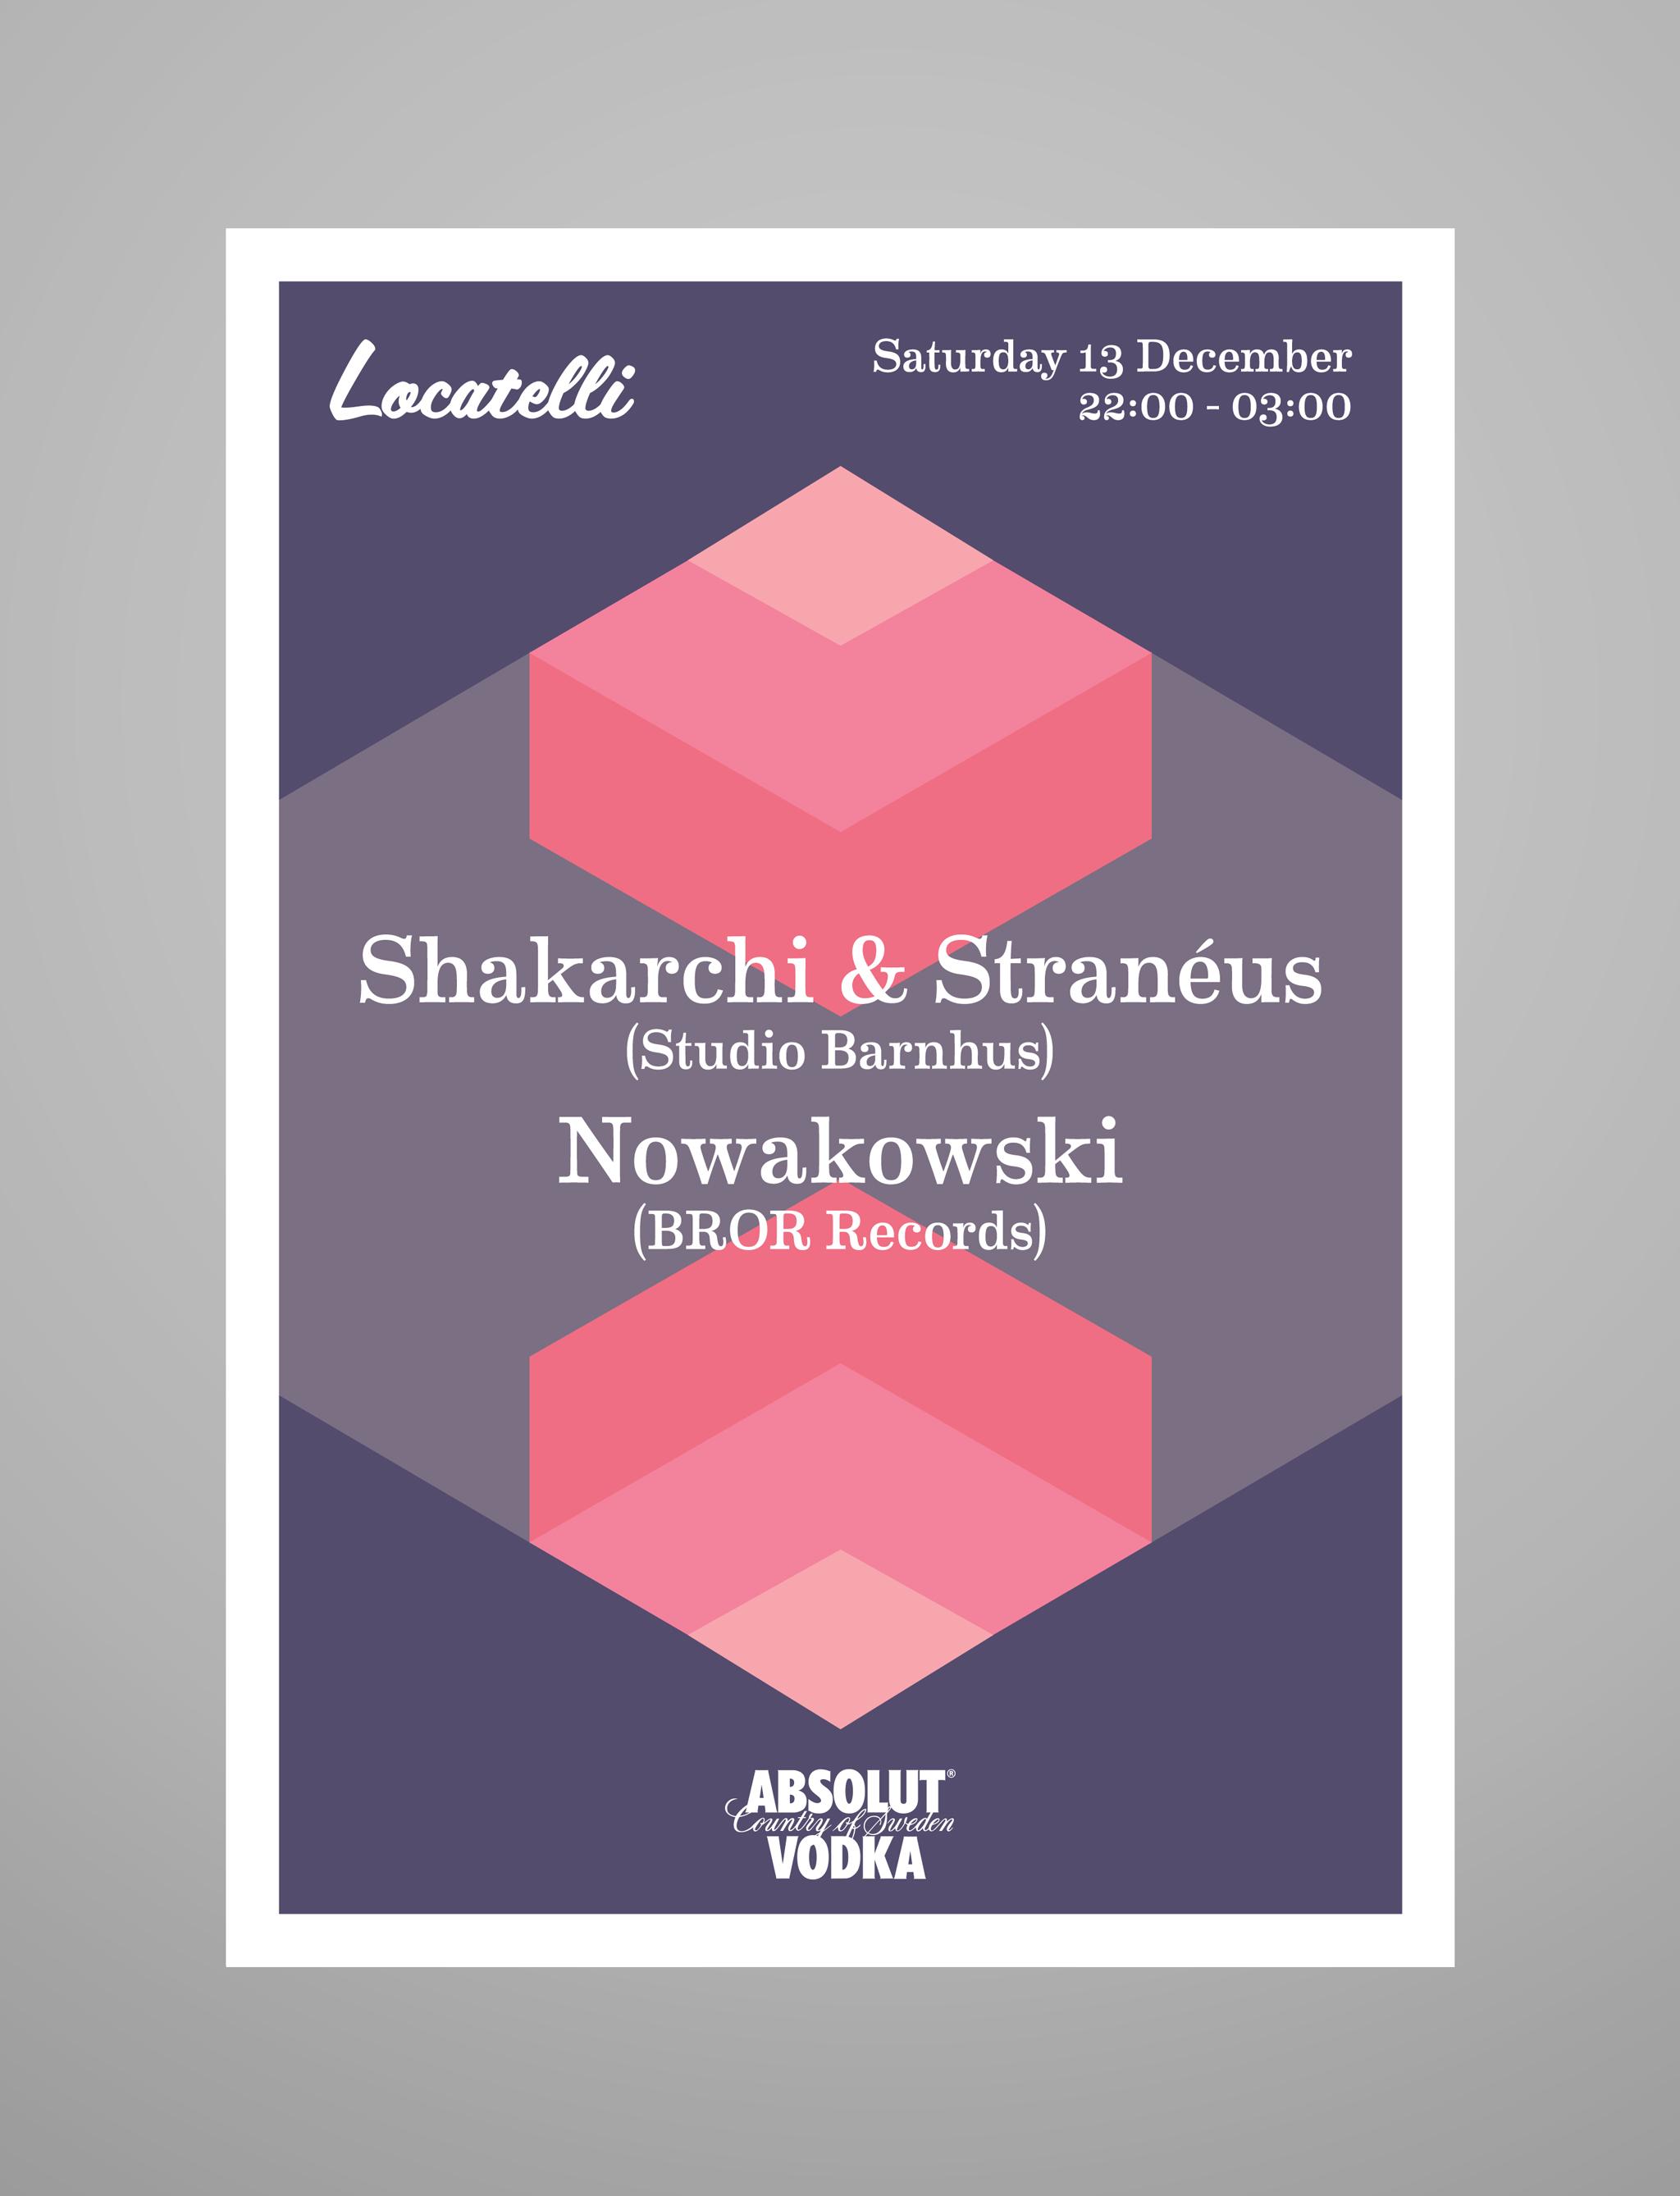 Locatelli_Poster-Mockup.jpg